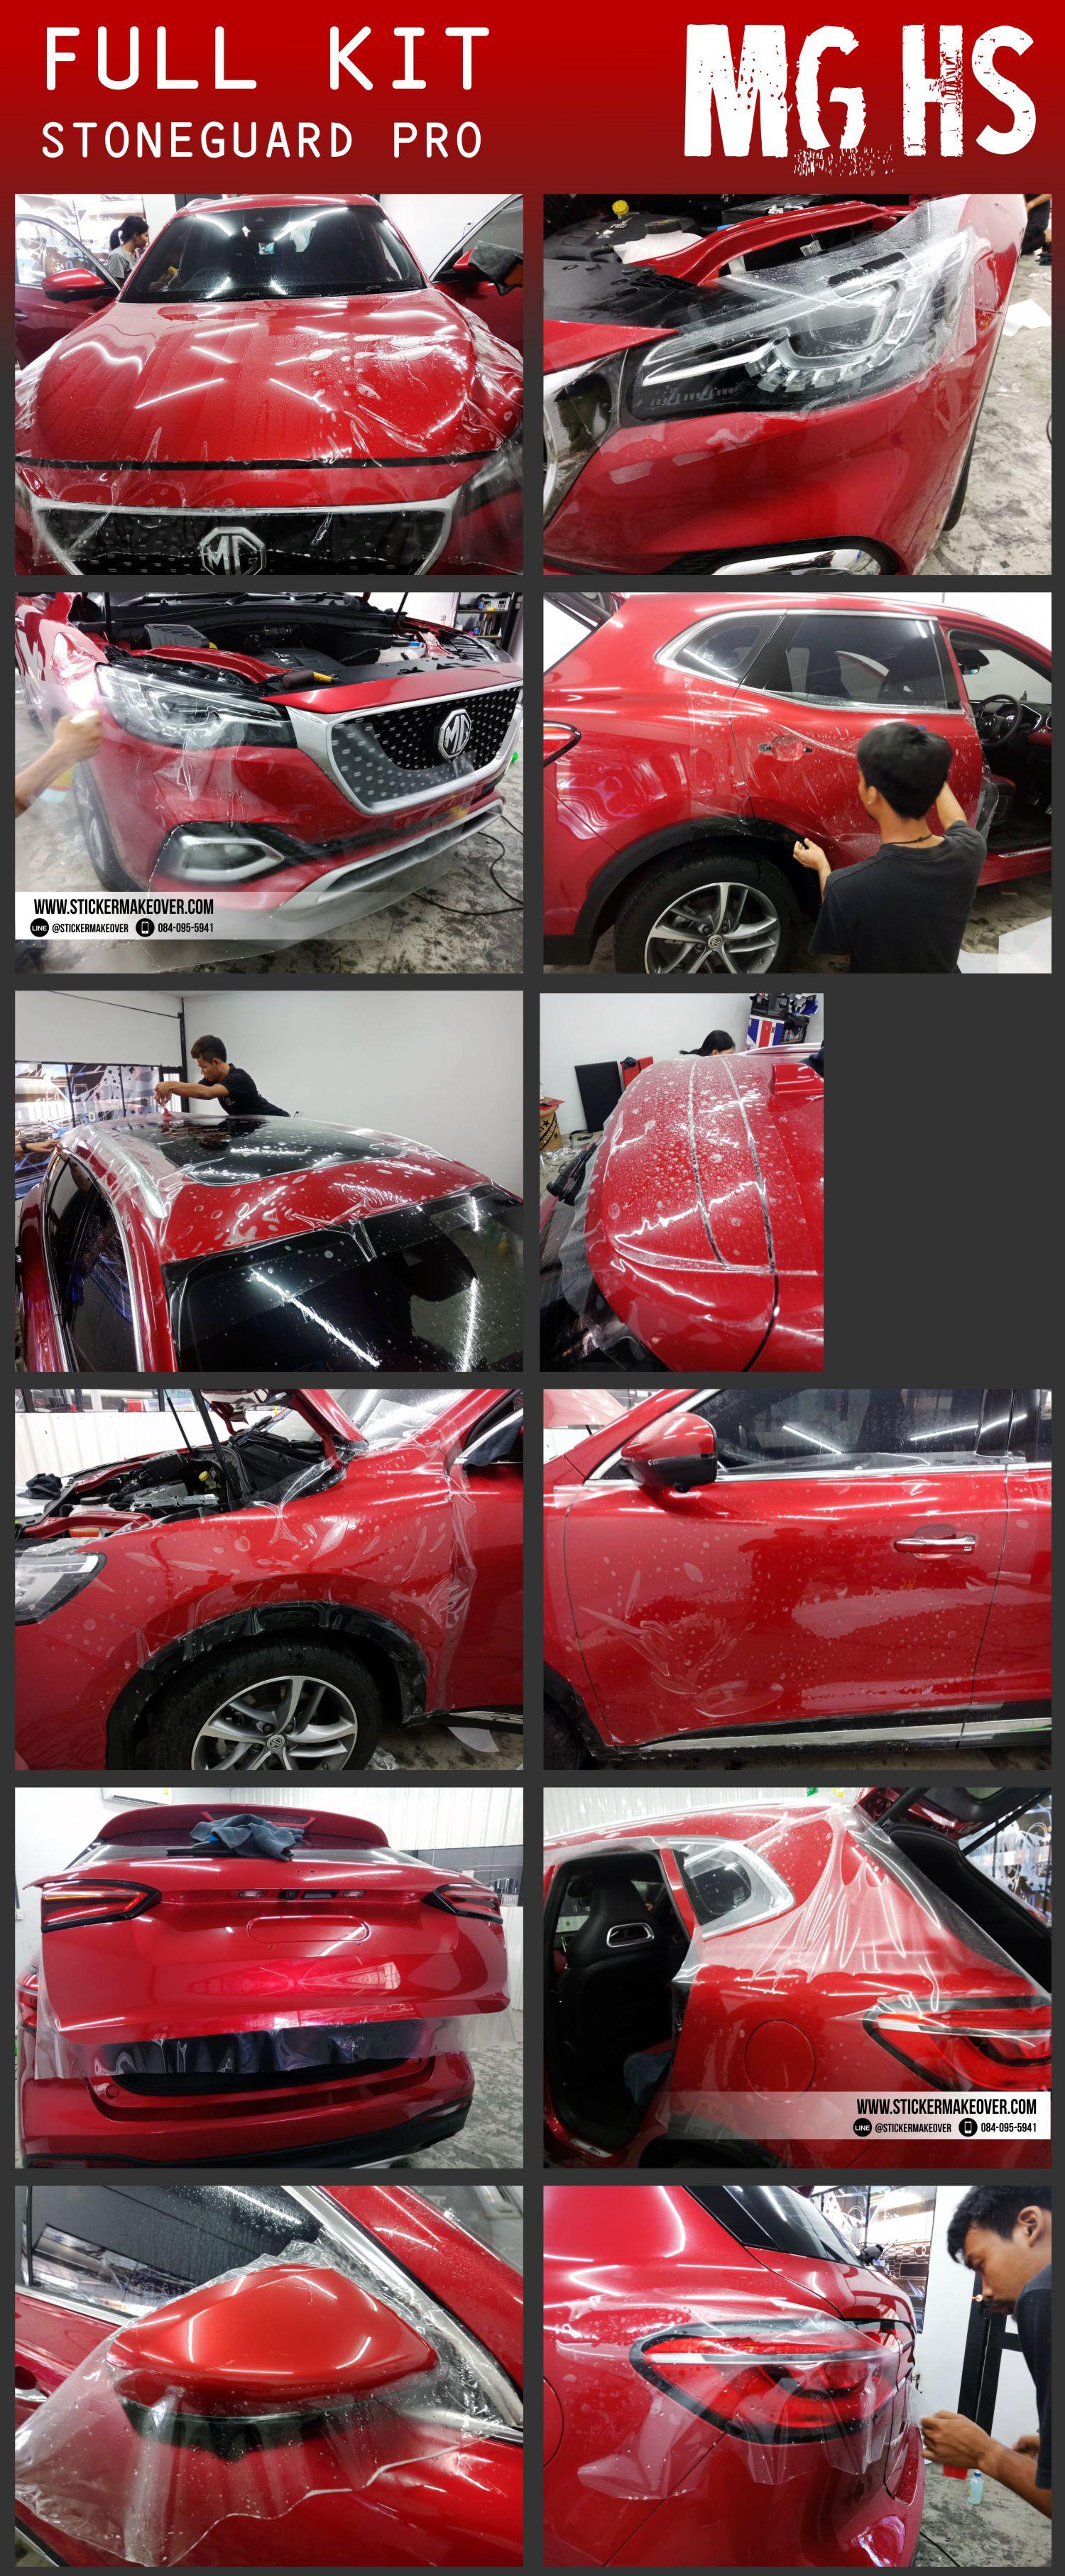 MG HS mg hs ฟิล์มใสกันรอยรถยนต์mg hs  ฟิล์มใสกันสะเก็ดหิน ฟิล์มปกป้องสีรถ paint protection film ppf ฟิล์มกันรอยMG HS